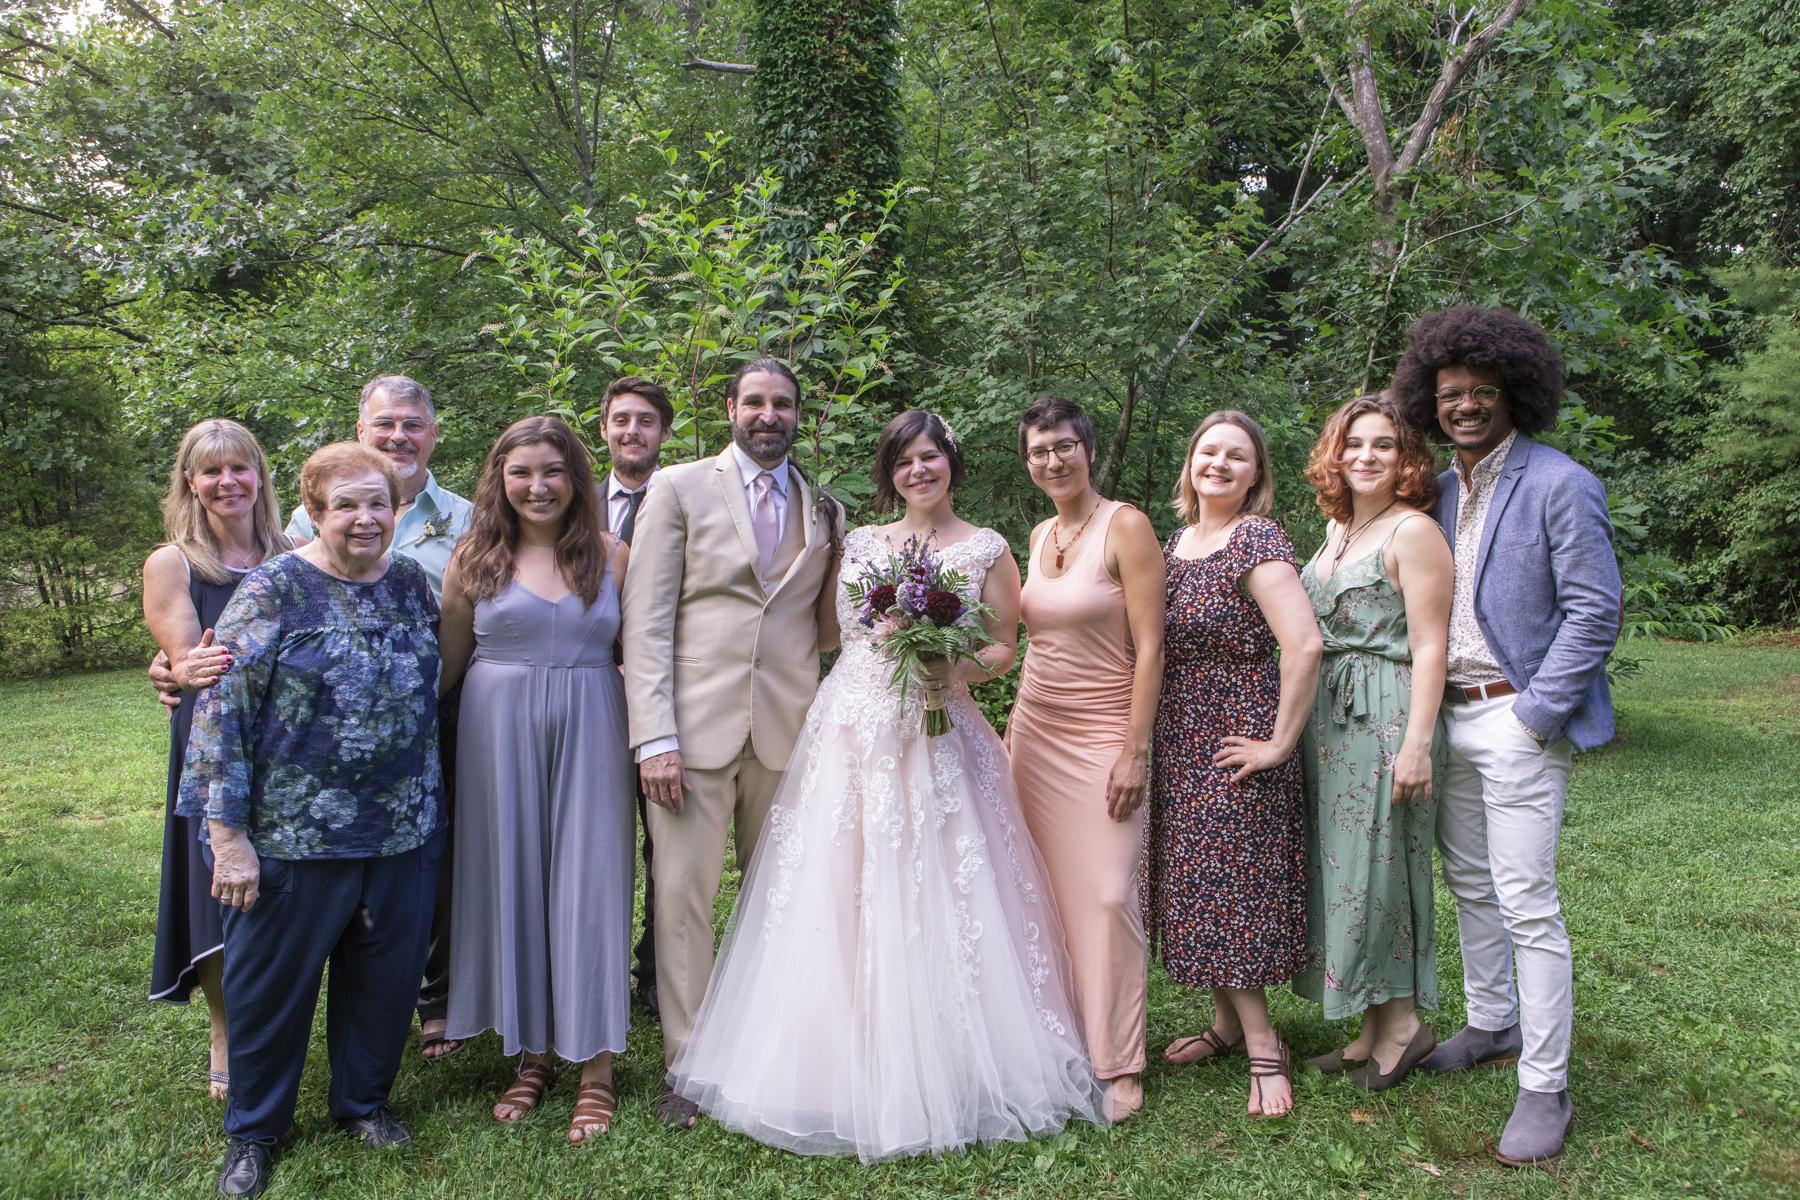 Avyanna and Phoenix Wedding 2019_photos by Studio Misha_BLOG-110.jpg